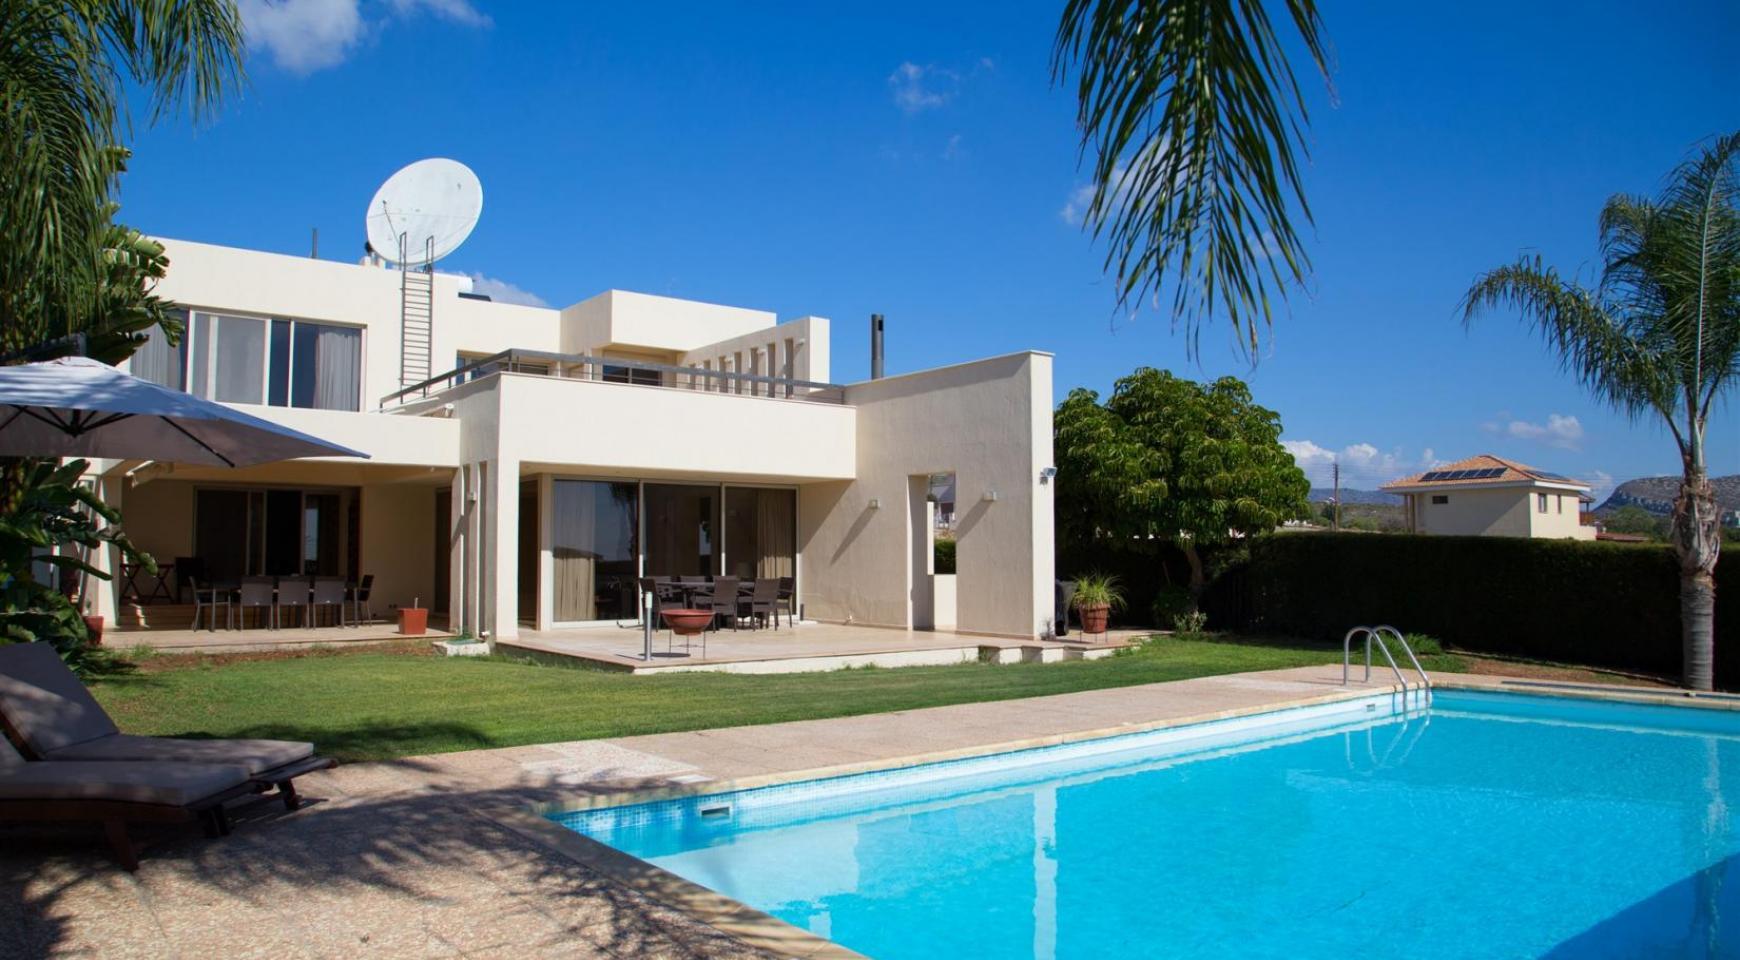 Modern Luxury 4 Bedroom Villa in Sfalagiotisa, Agios Athanasios - 3